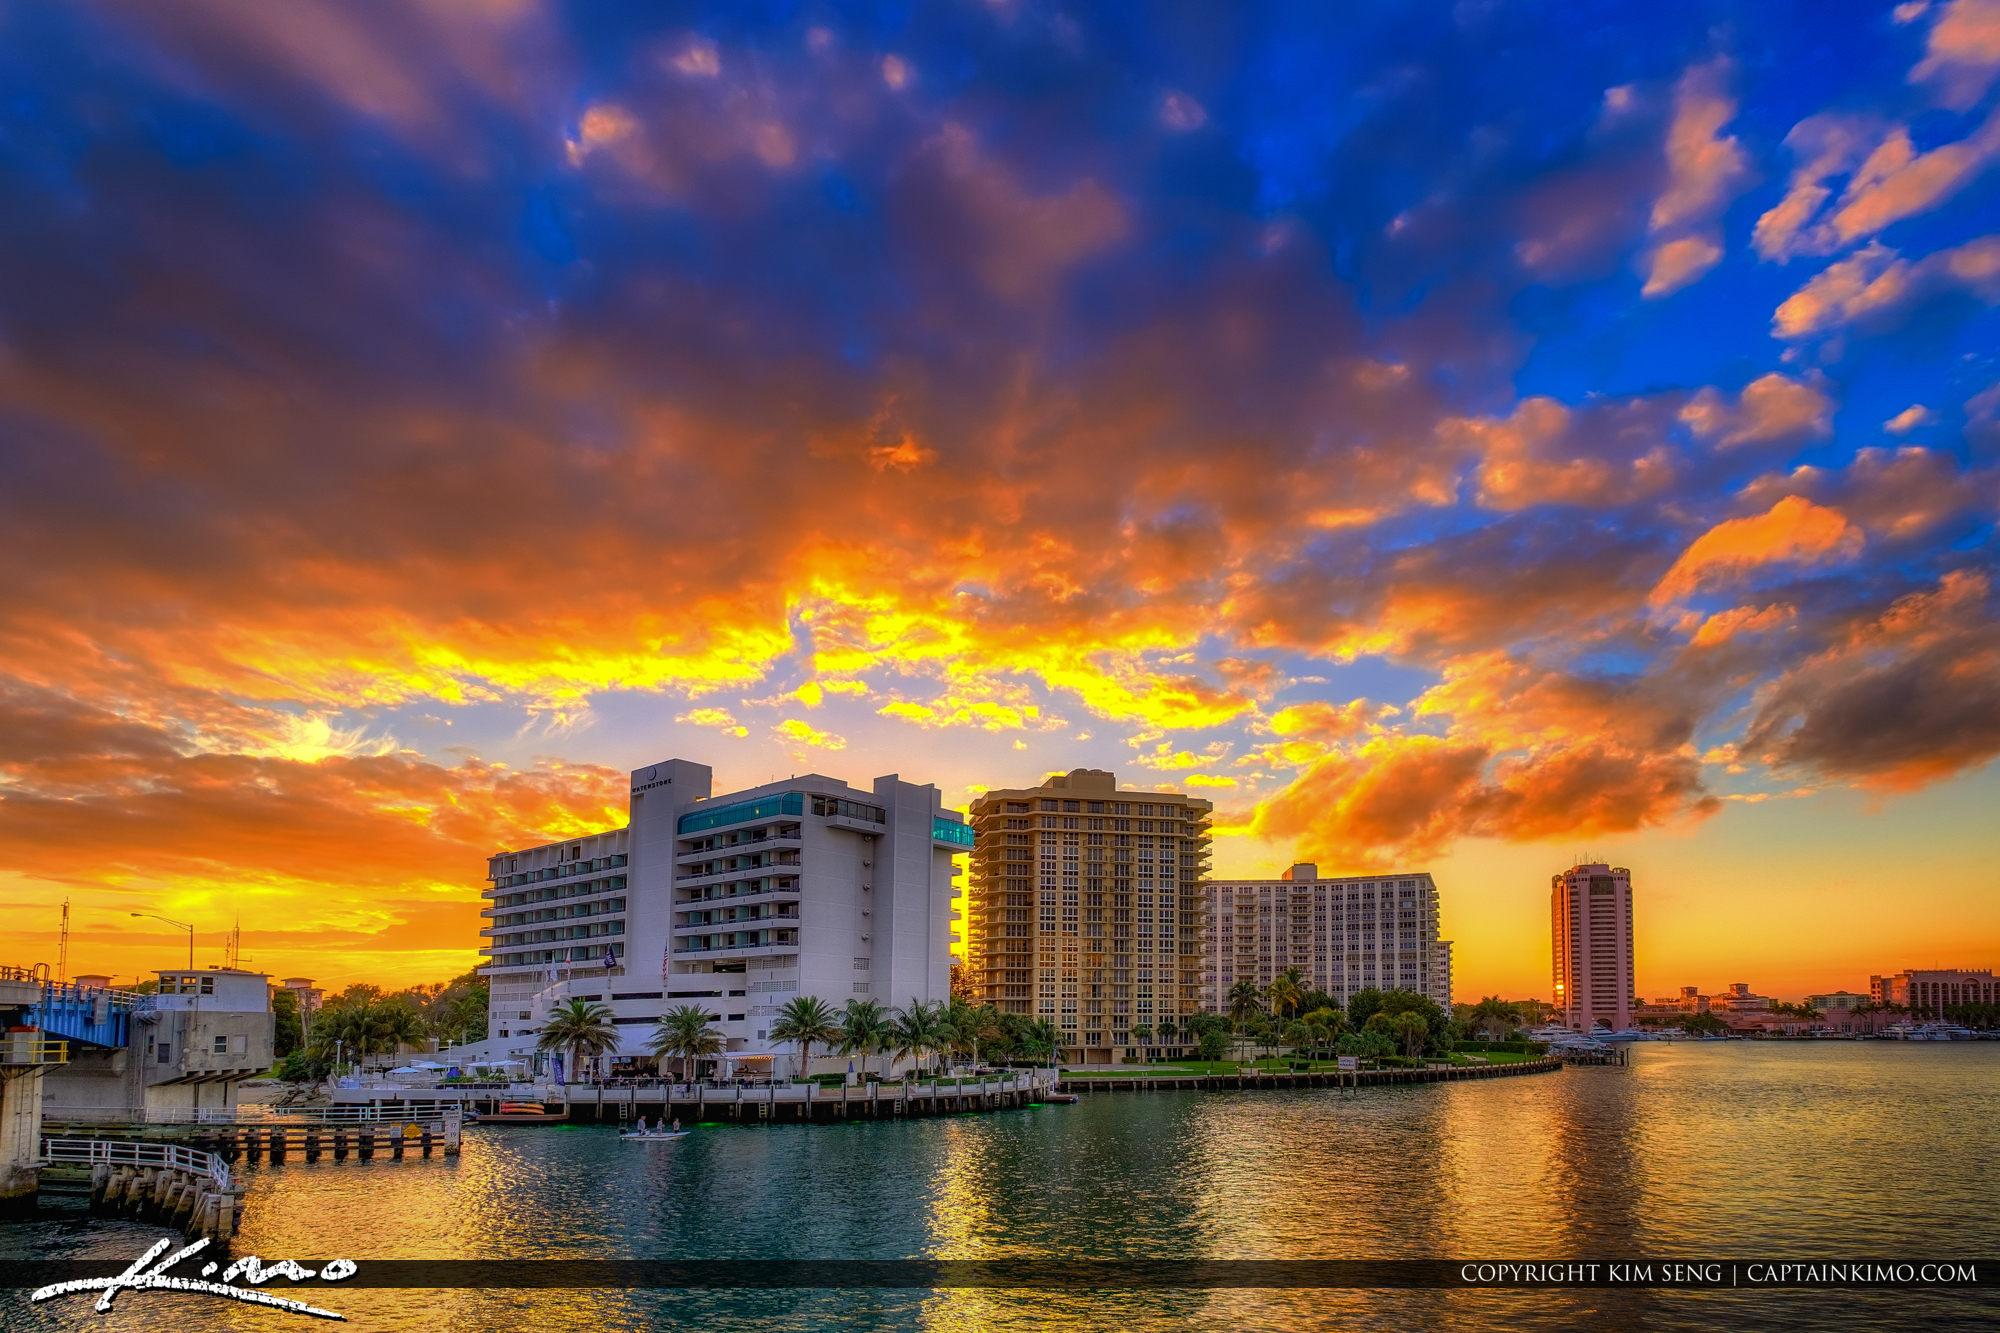 Waterstone Resort & Marina Boca Raton Sunset at Lake Boca Raton